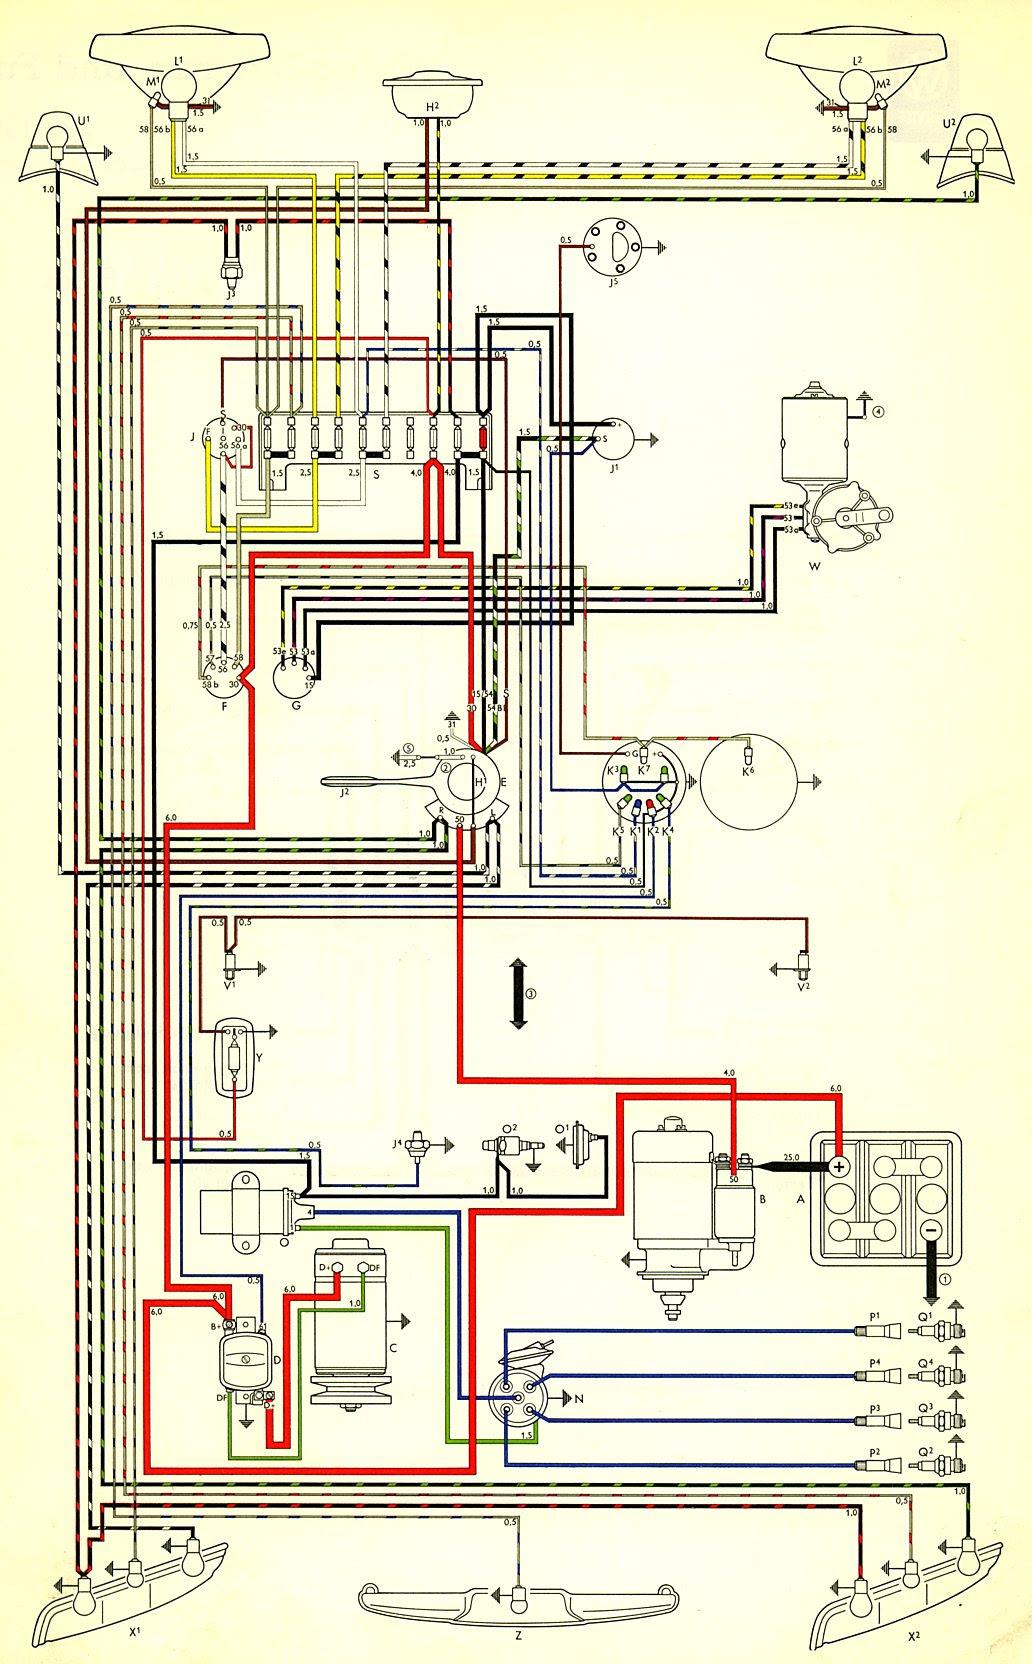 69 Porsche Wiring Diagram Wiring Diagram Inspection Inspection Consorziofiuggiturismo It